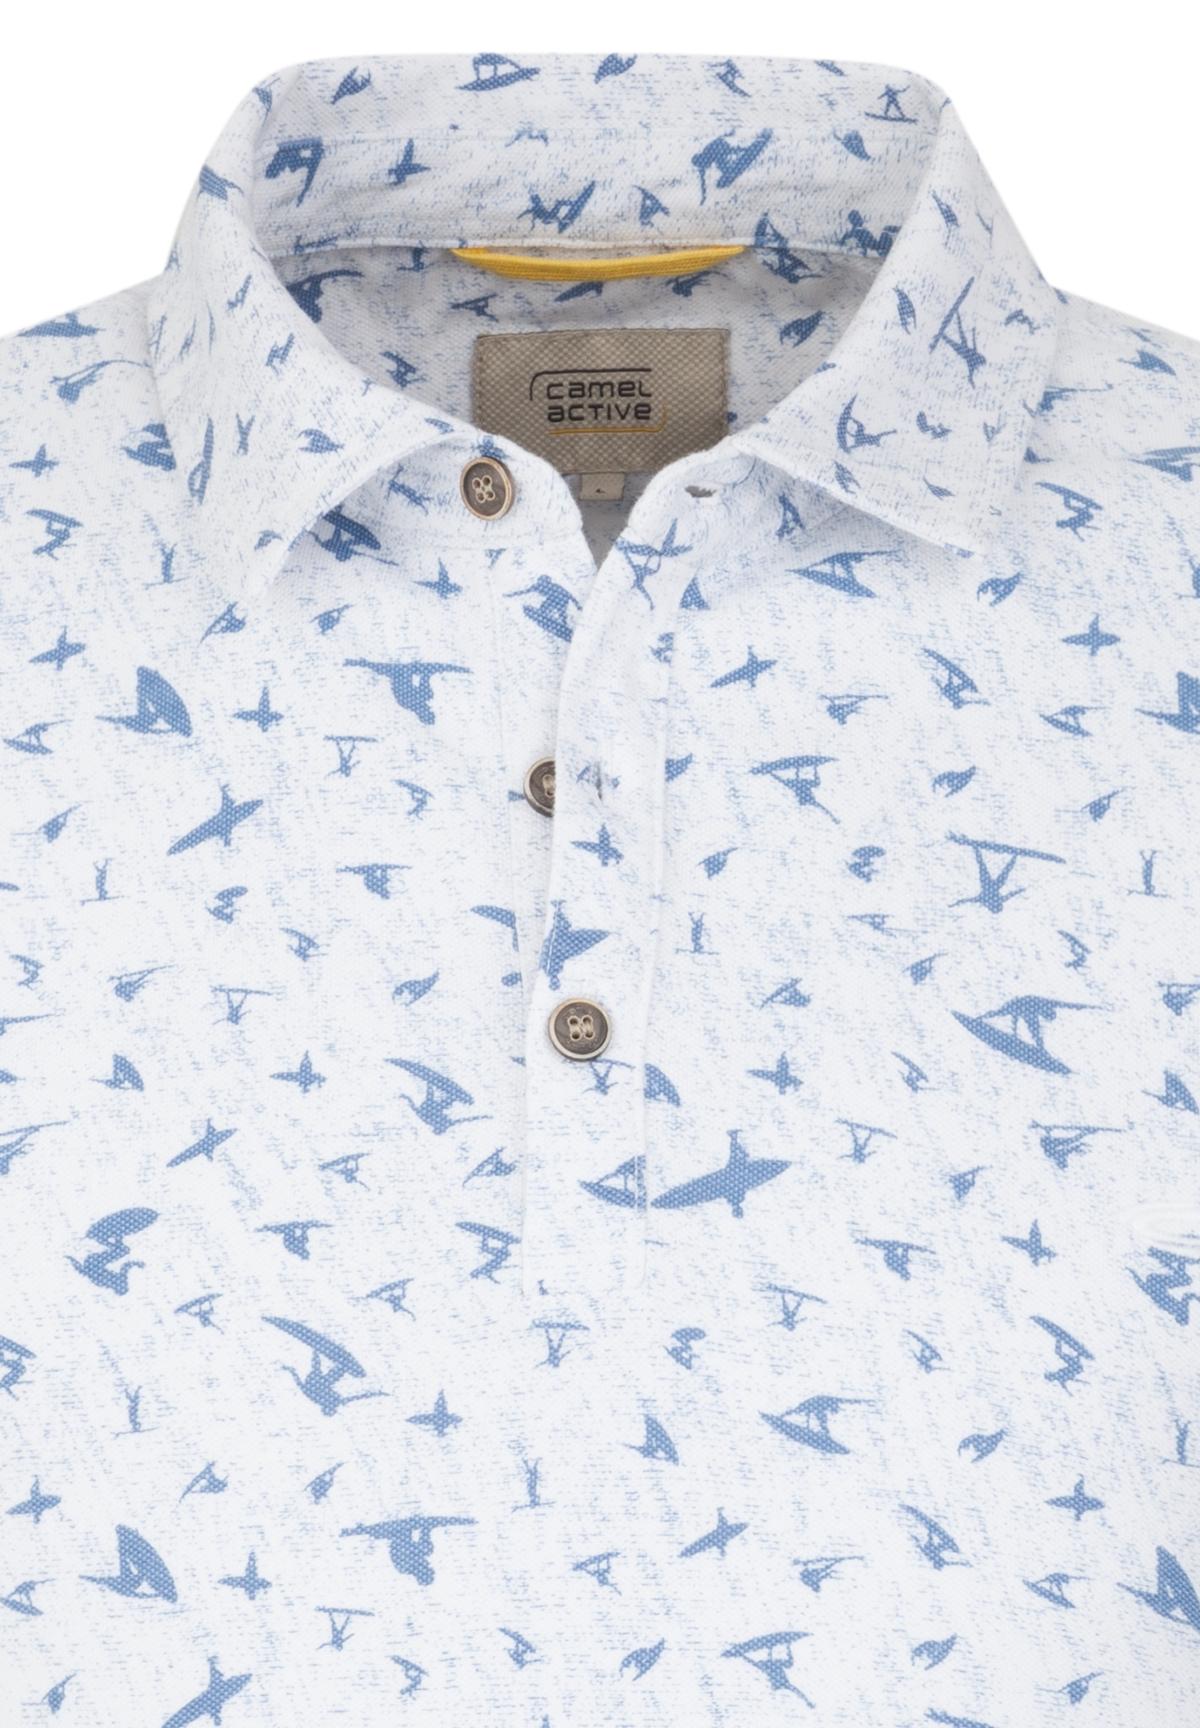 Camel-Active-Herren-Shirt-Poloshirt-Pique-Regular-Fit-NEU Indexbild 10